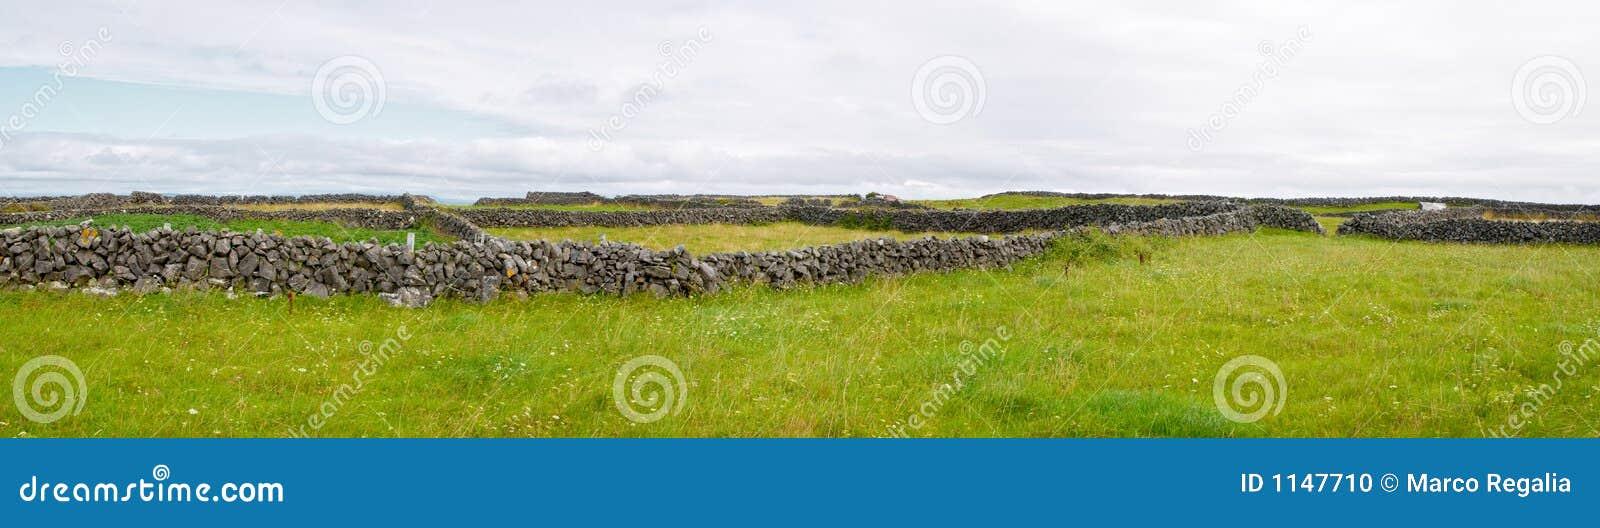 Iers platteland